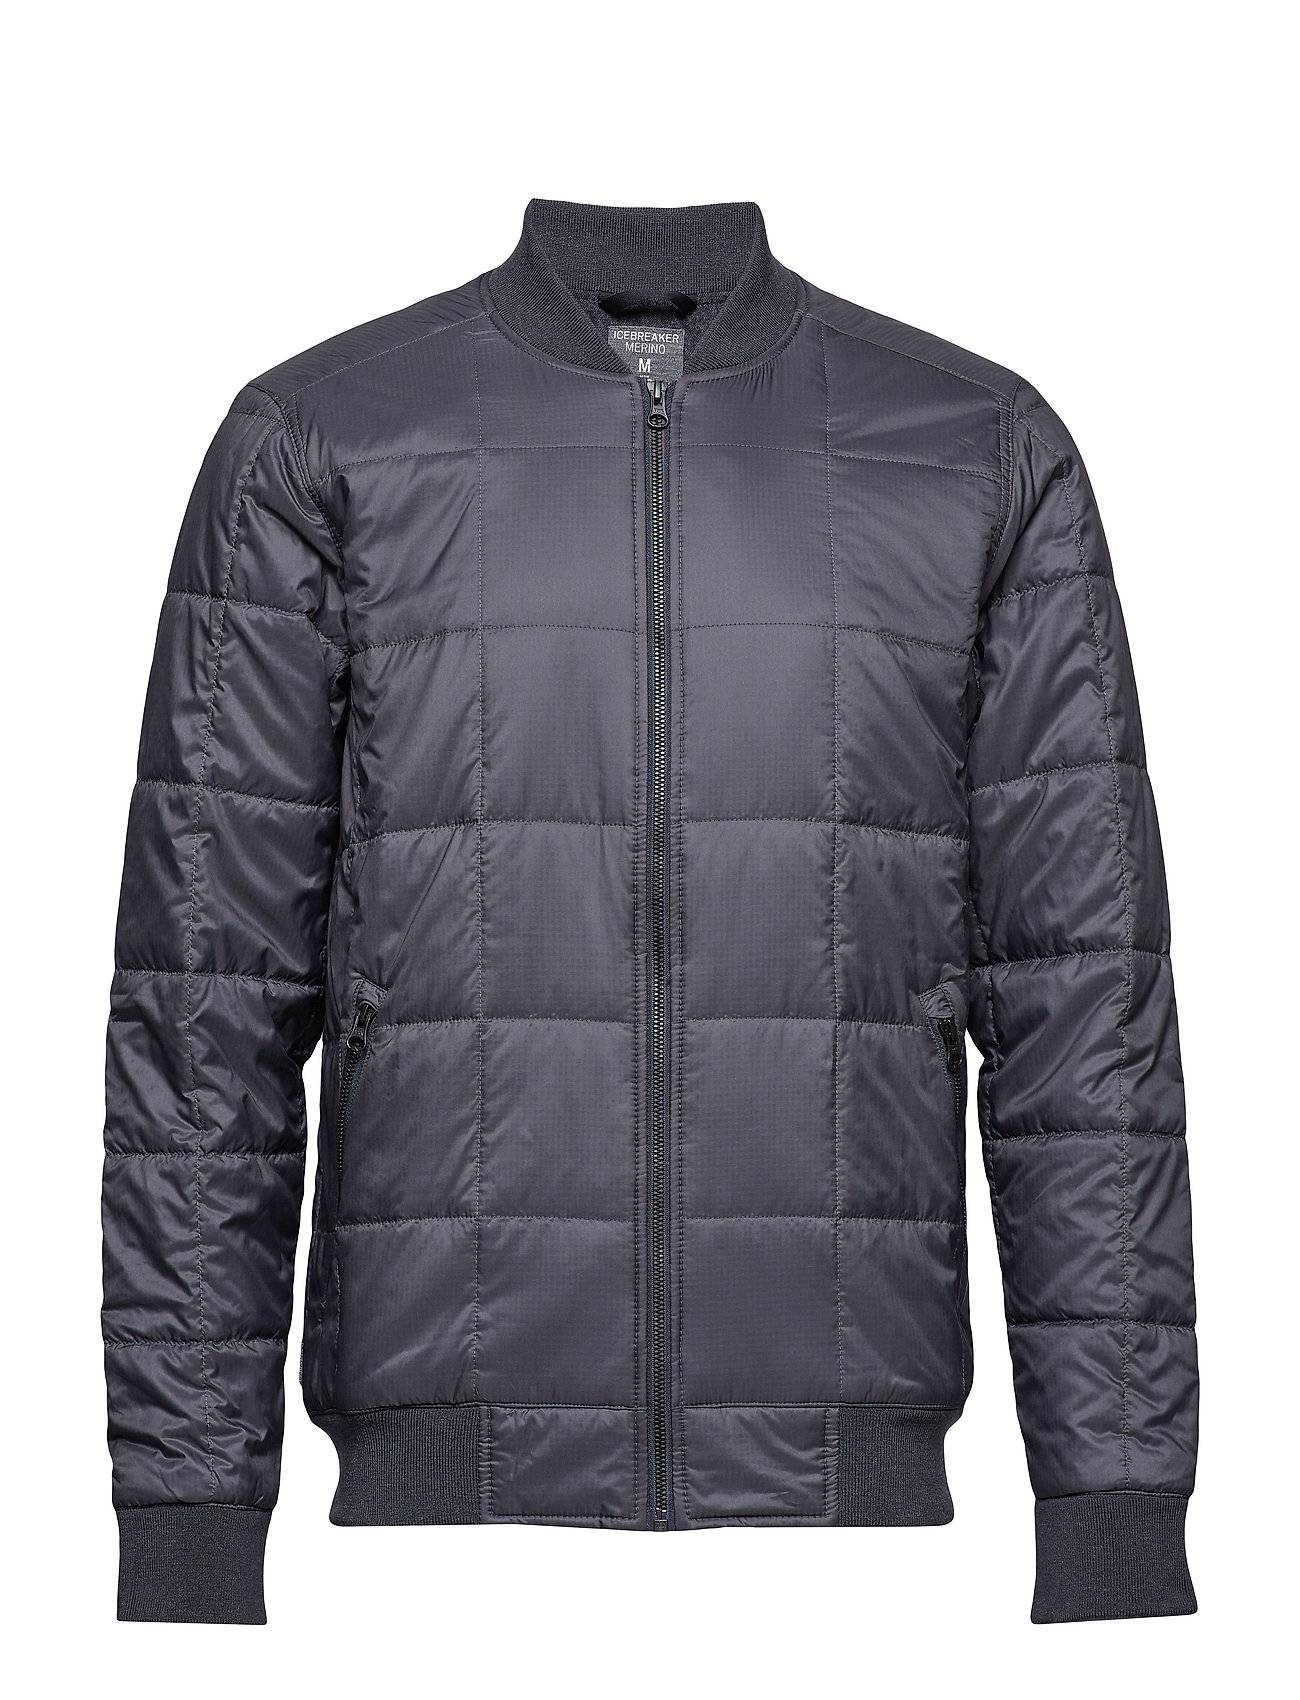 Icebreaker Mens Venturous Jacket